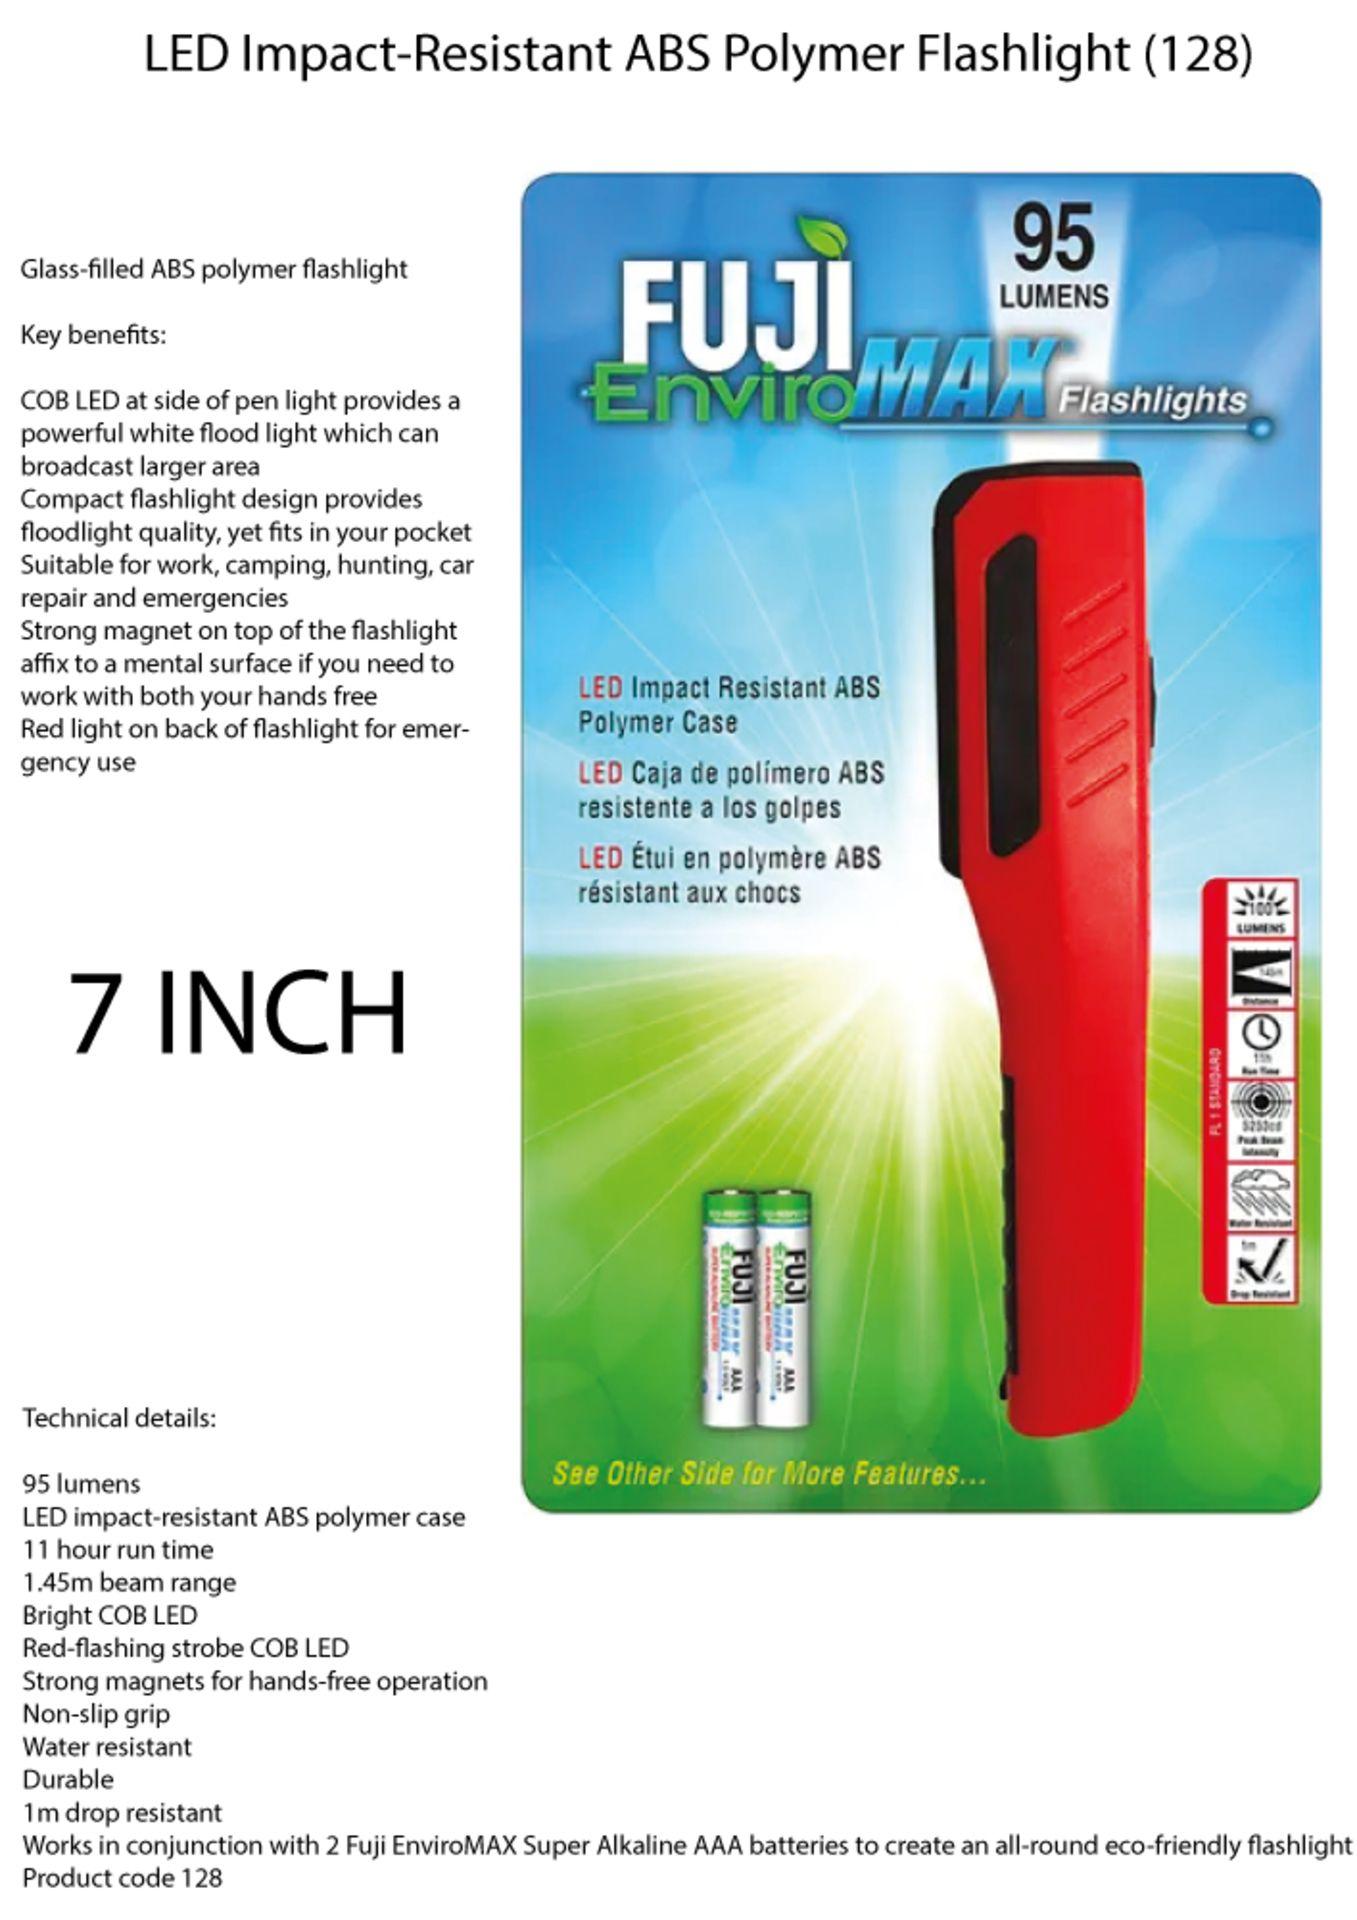 Lot 55 - Fuji EnviroMax 95 Lumens LED Flashlight